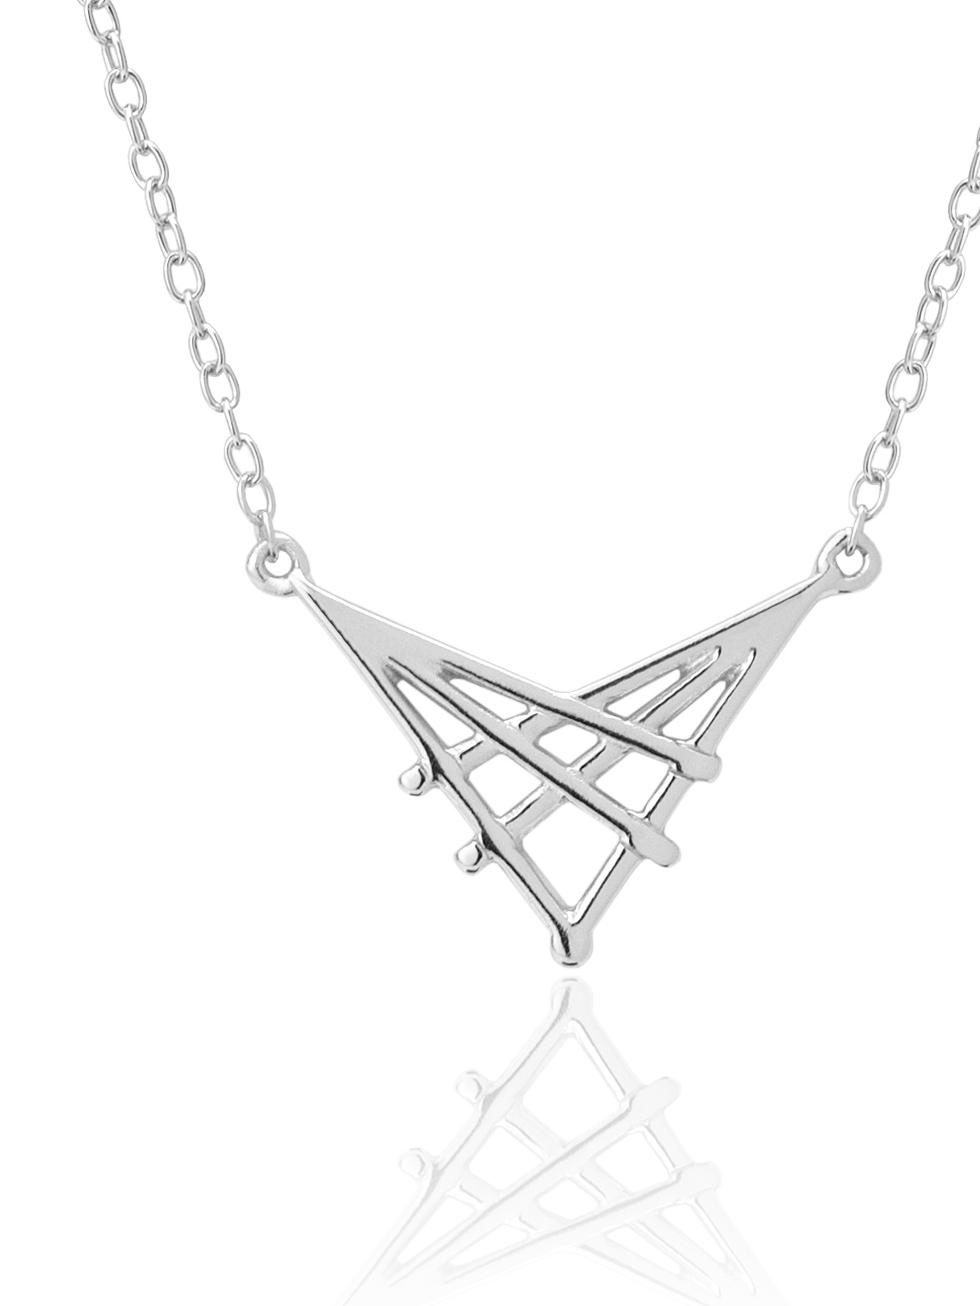 Collar crossed silver